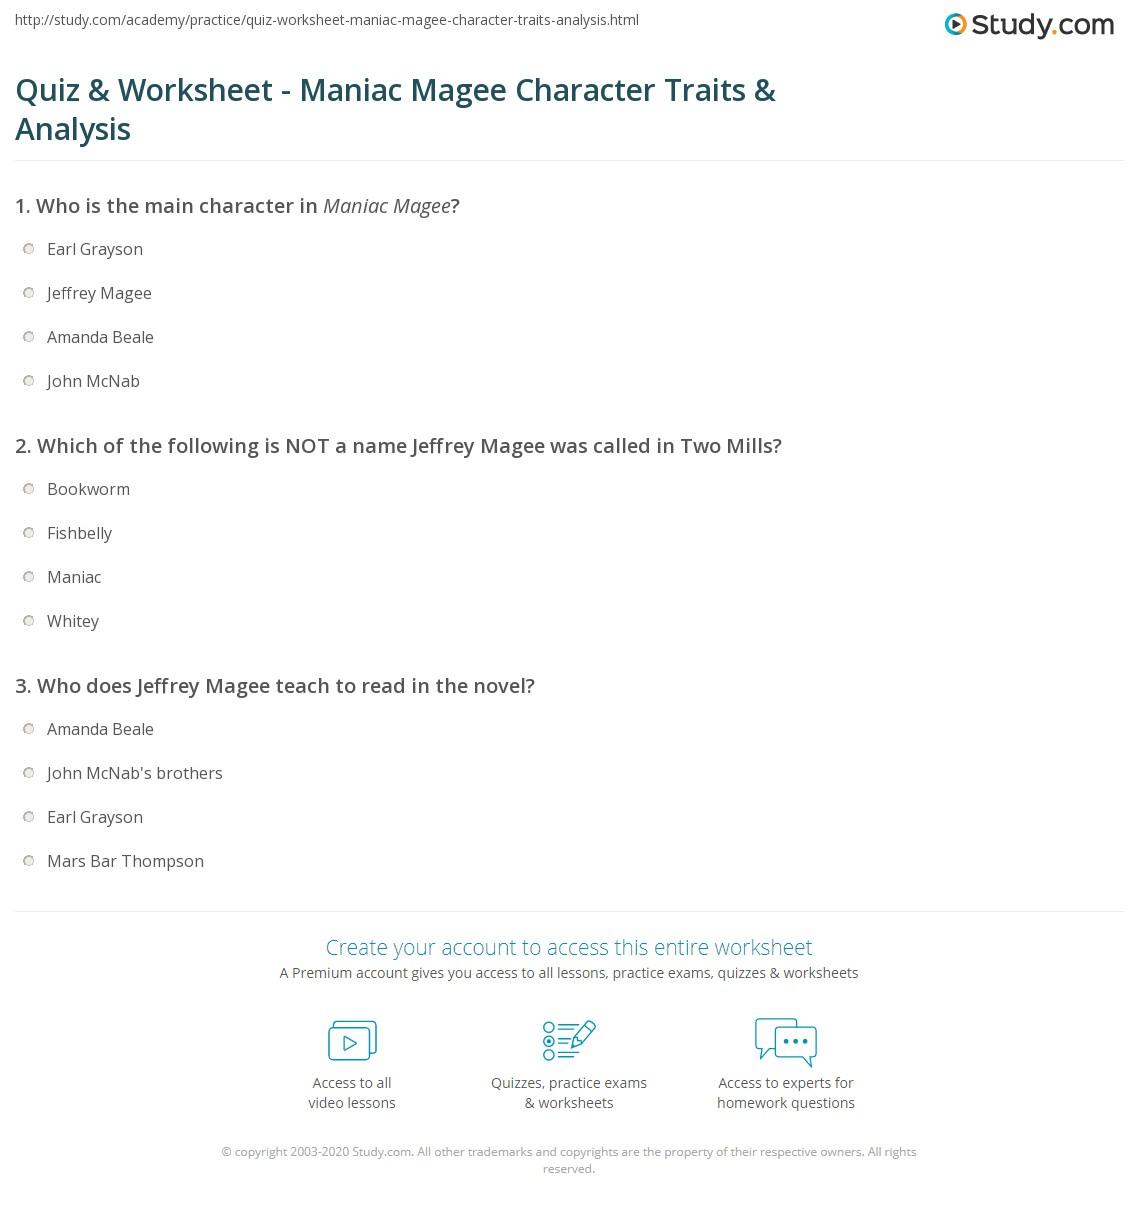 Quiz & Worksheet - Maniac Magee Character Traits & Analysis ...